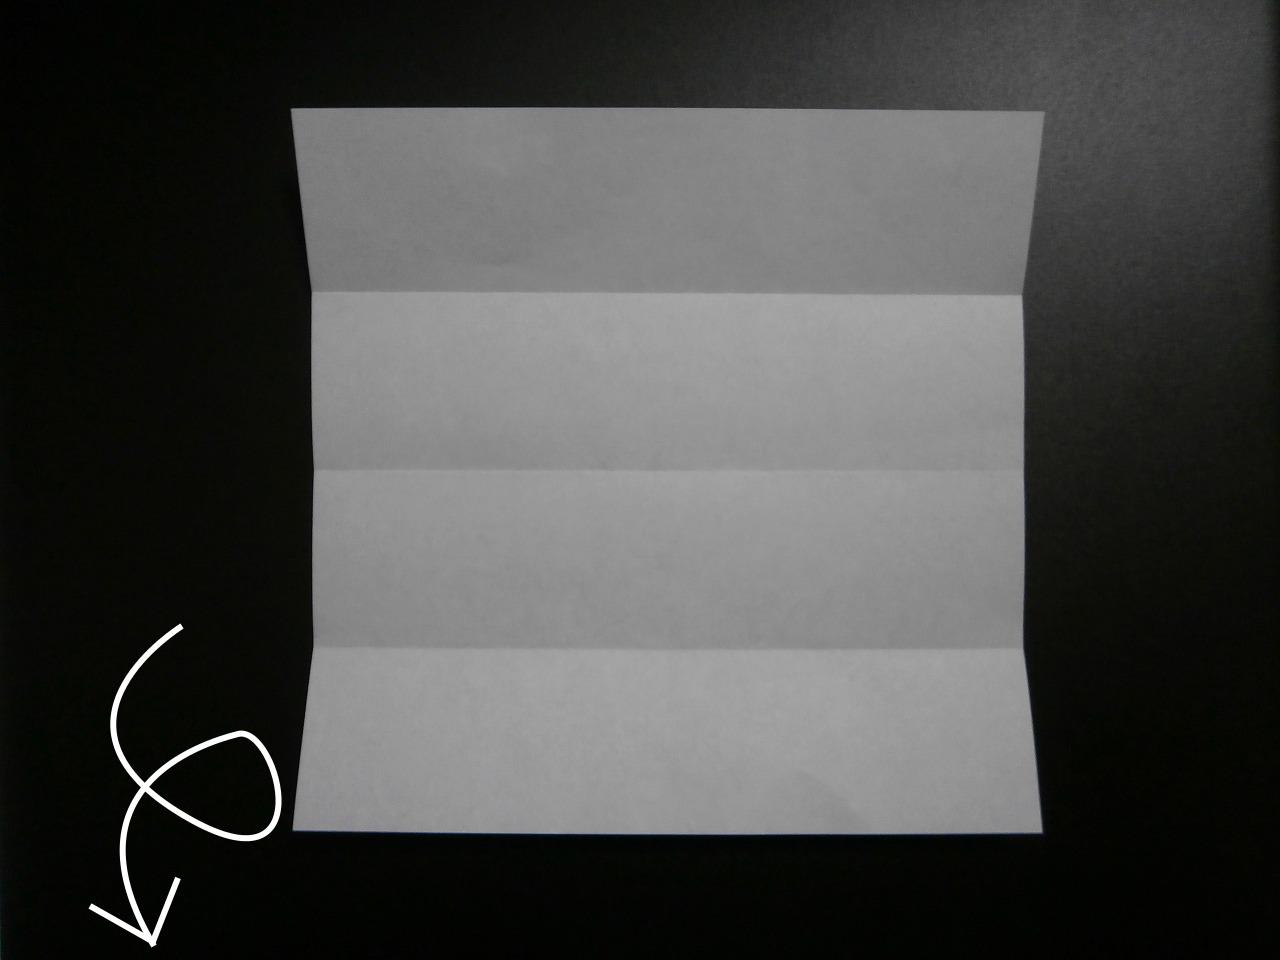 pleat fold origami 28 images katakoto origami quot